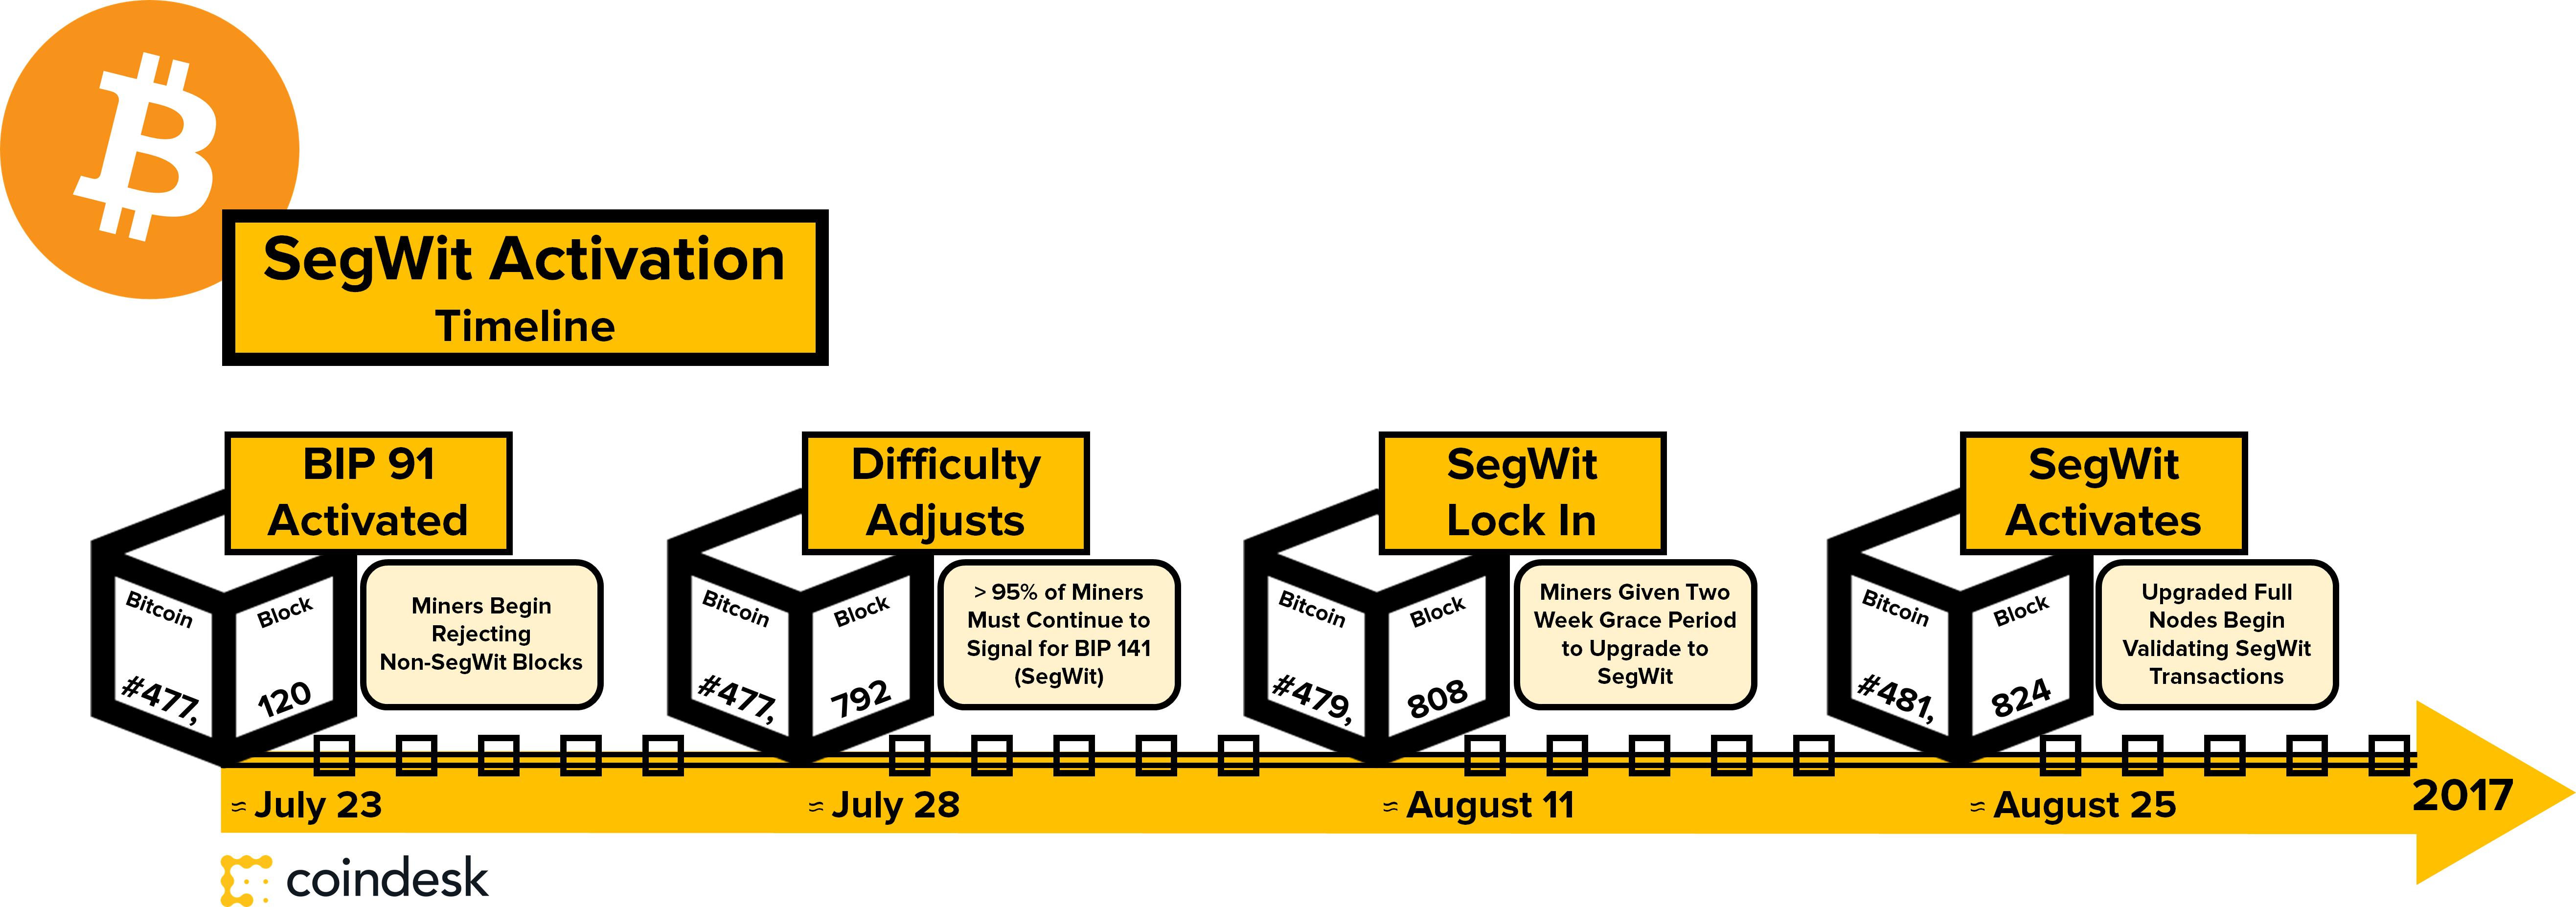 segwit-timeline